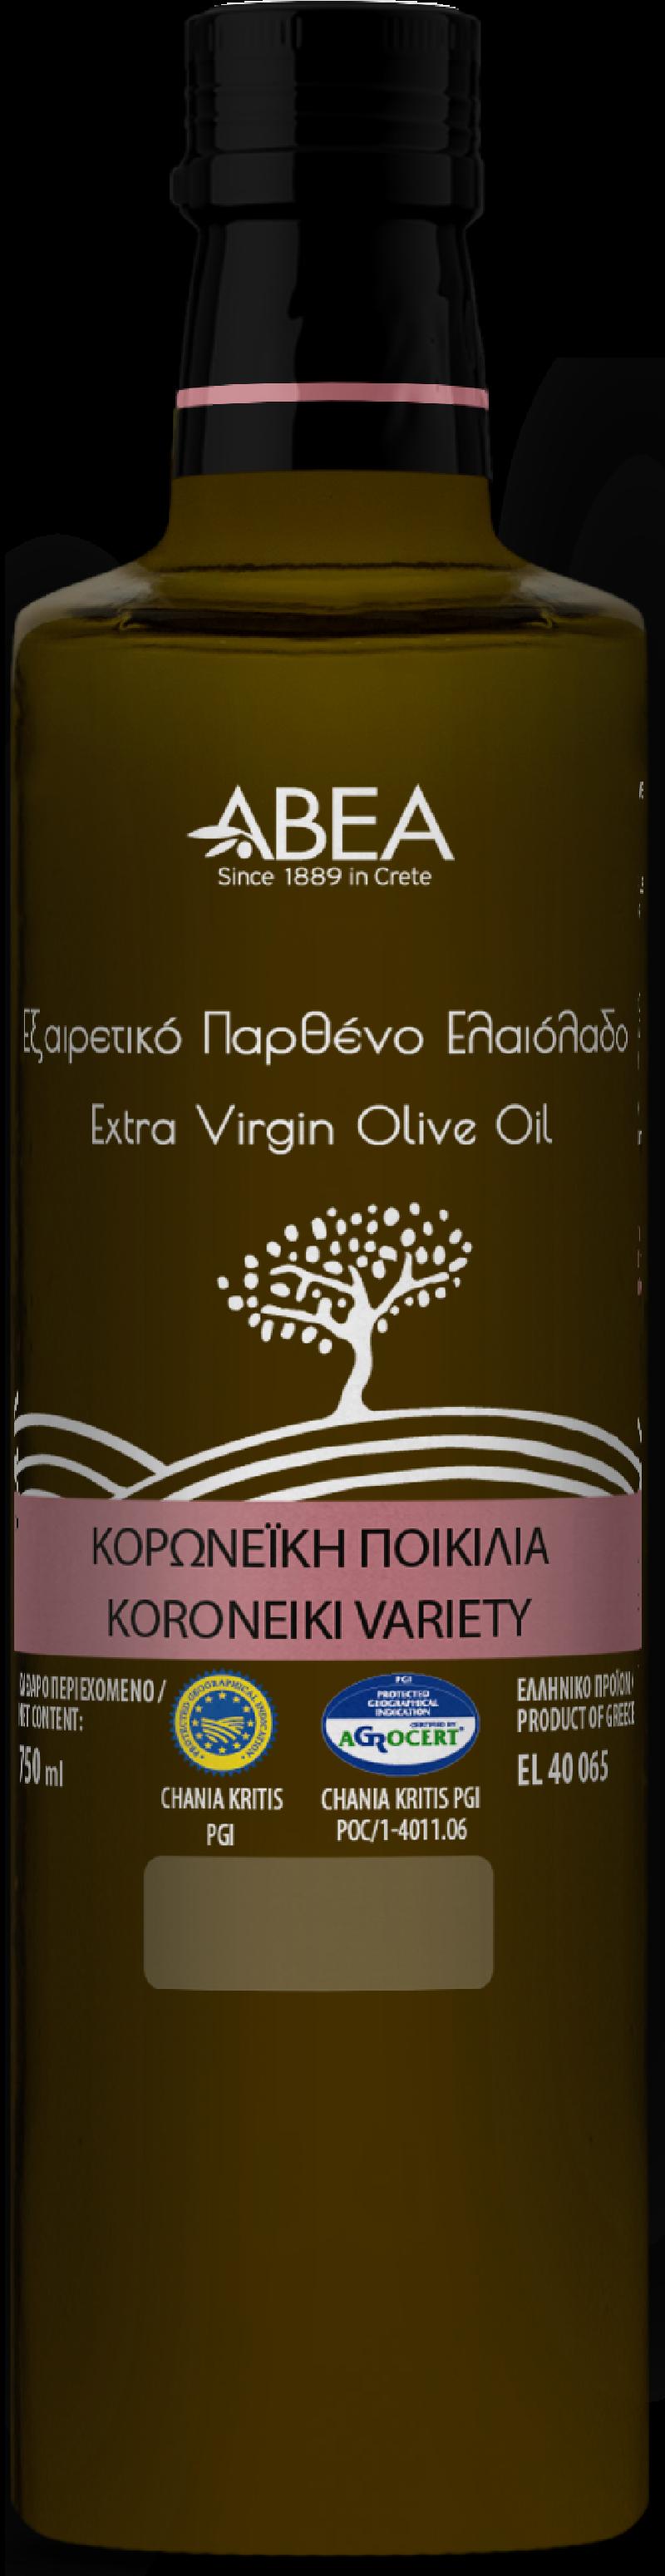 ABEA Koroneiki Monovarietal Extra Virgin Olive Oil- 750ml Dorica Glass Bottle